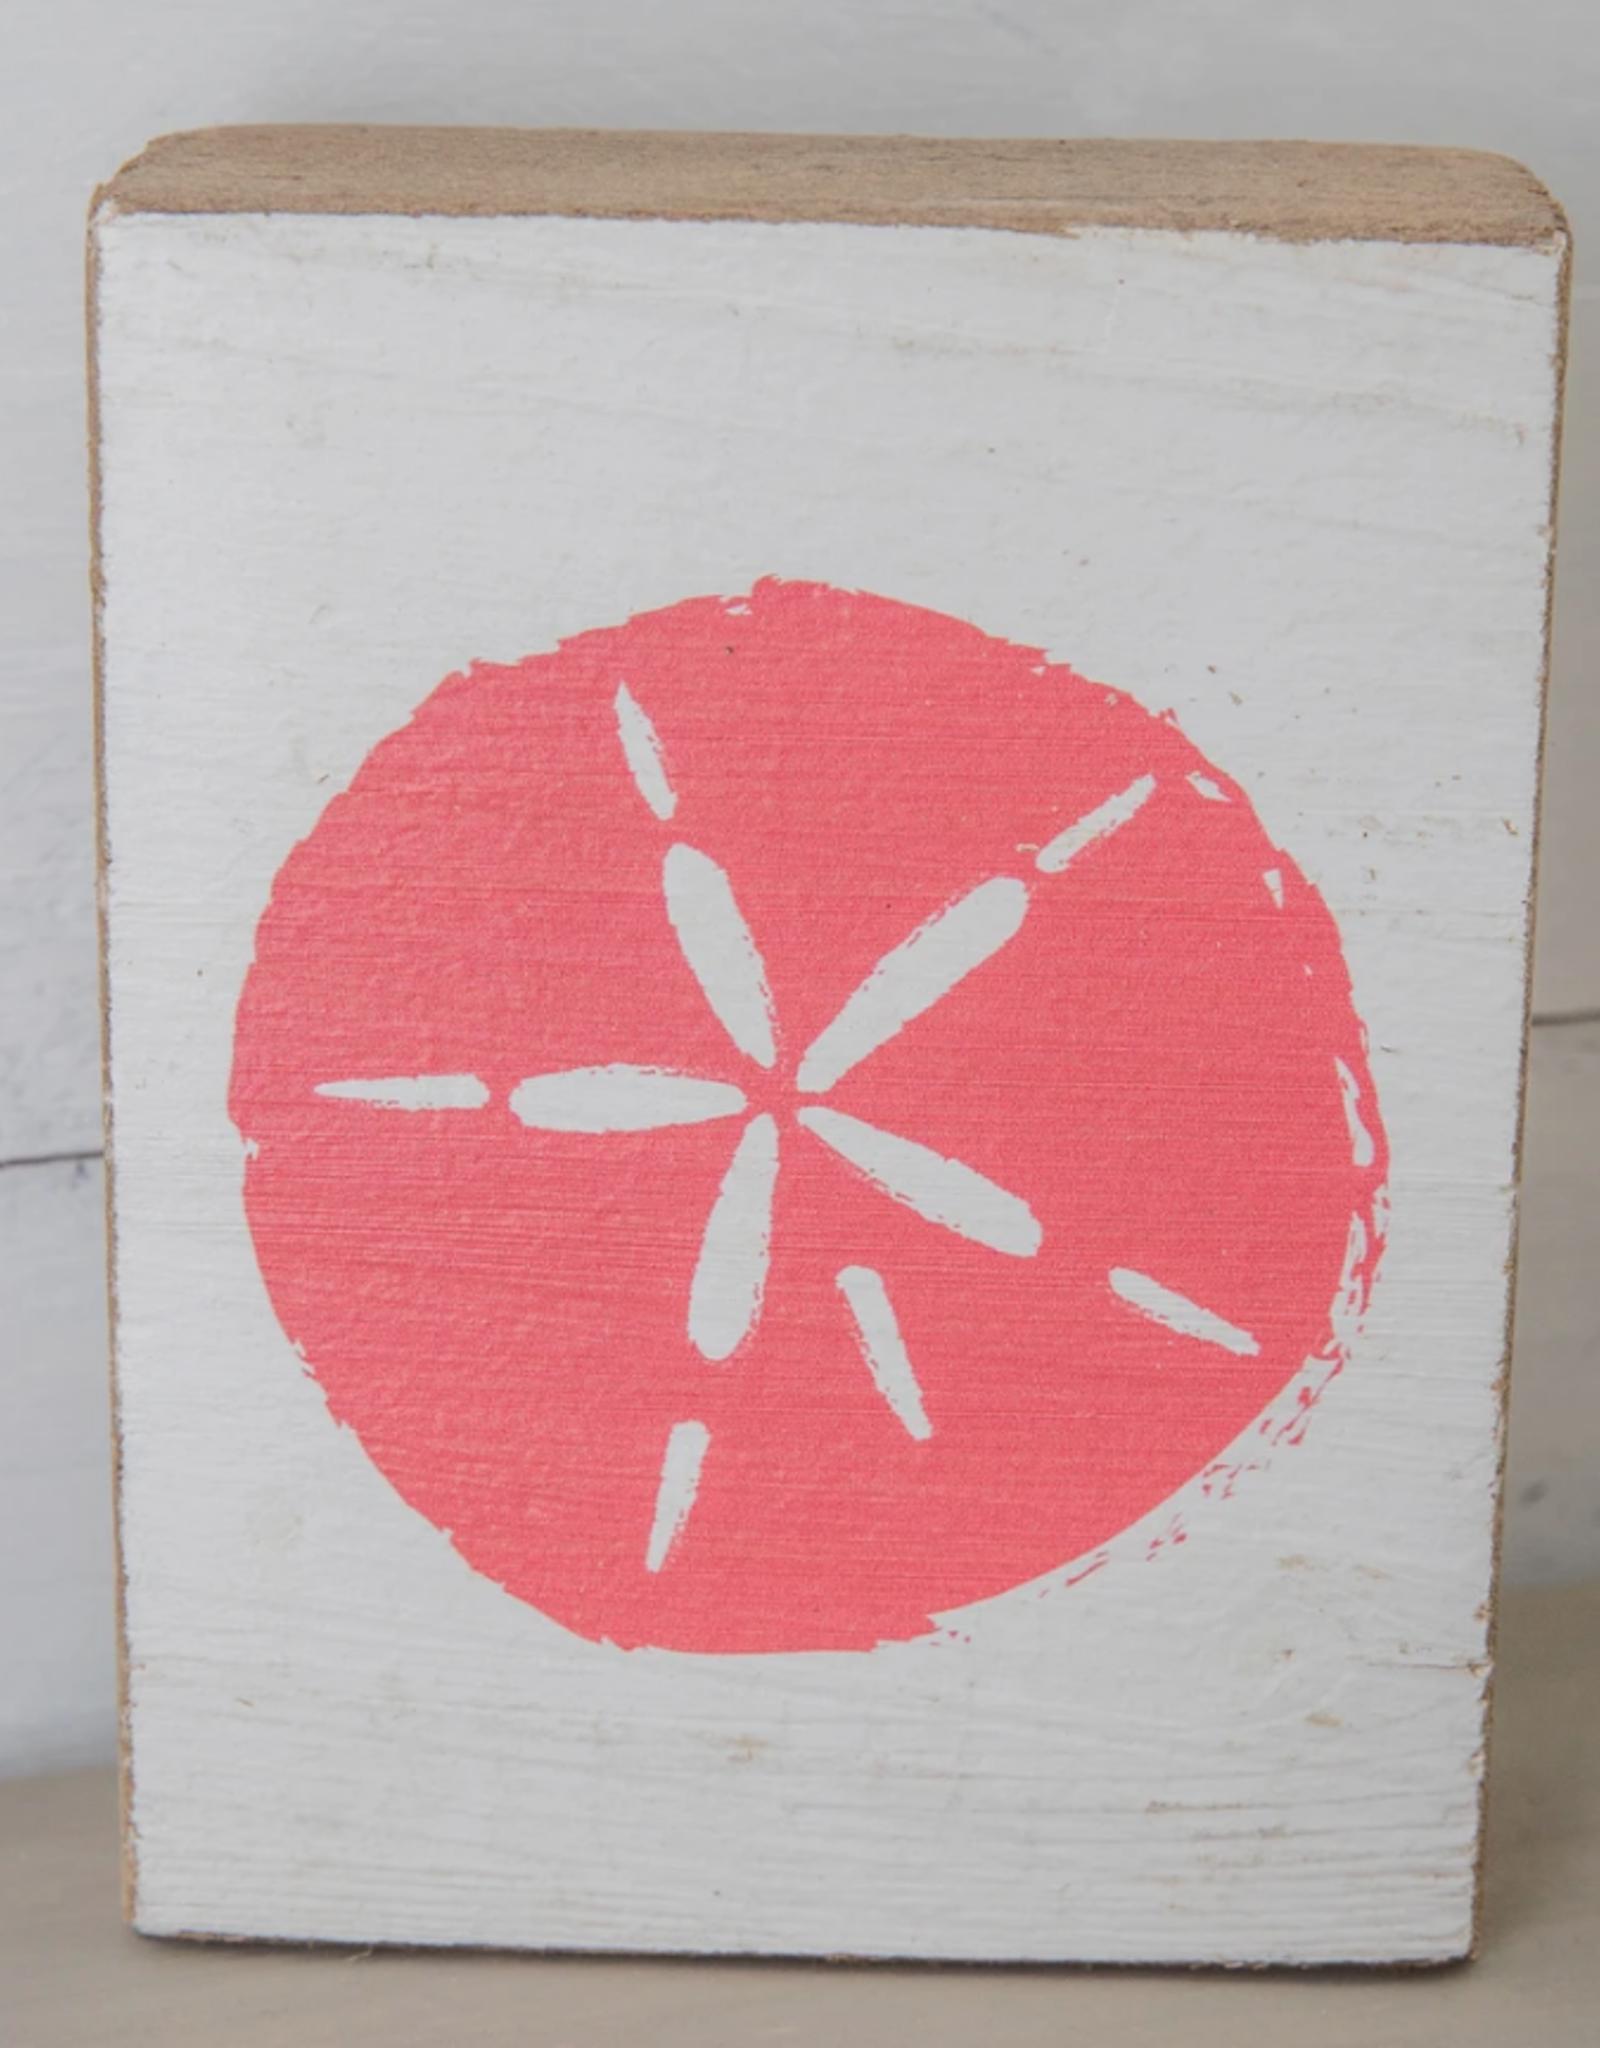 Rustic Marlin Rustic Marlin - Symbol Blocks Sand Dollar - Coral